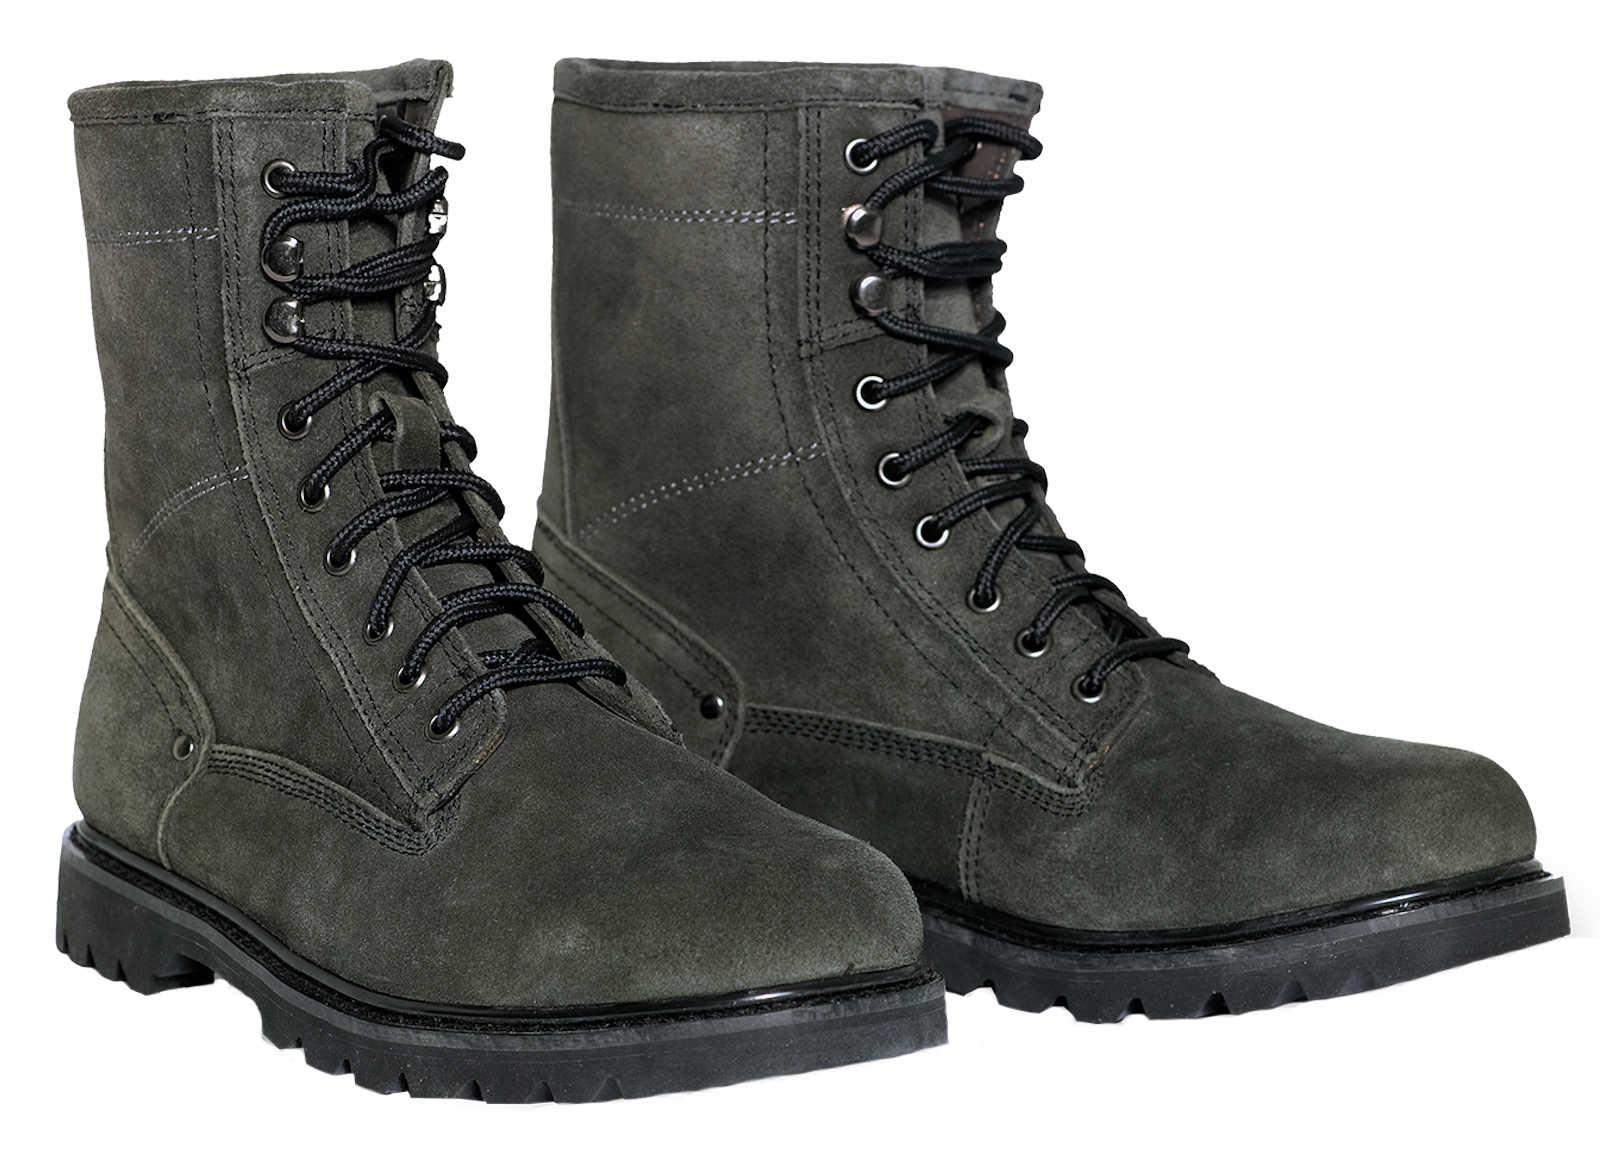 Brandit Uomo Gladstone leatherboot 9015 Pelle Vintage Stivali Stivali Vintage Caldi Escursionismo ed98df